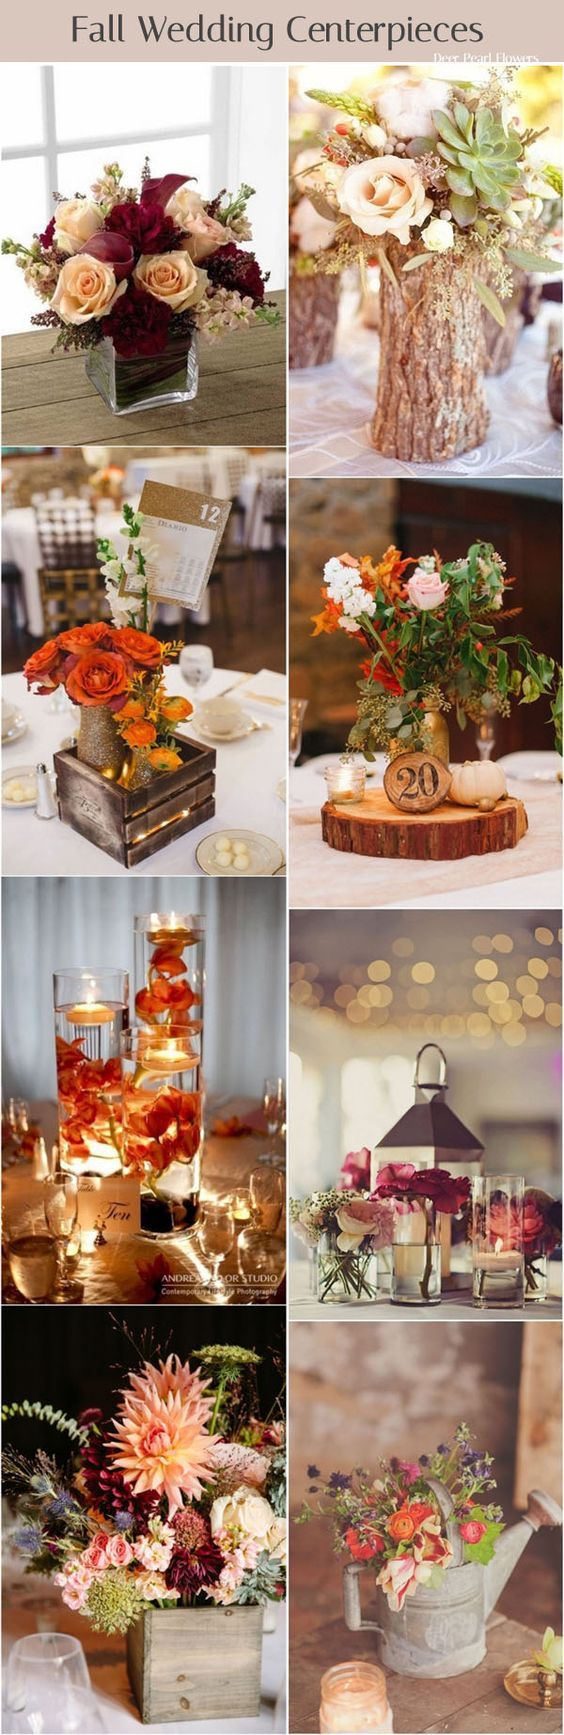 Fall wedding reception decor   of the Best Fall Wedding Ideas for   Wedding centerpieces